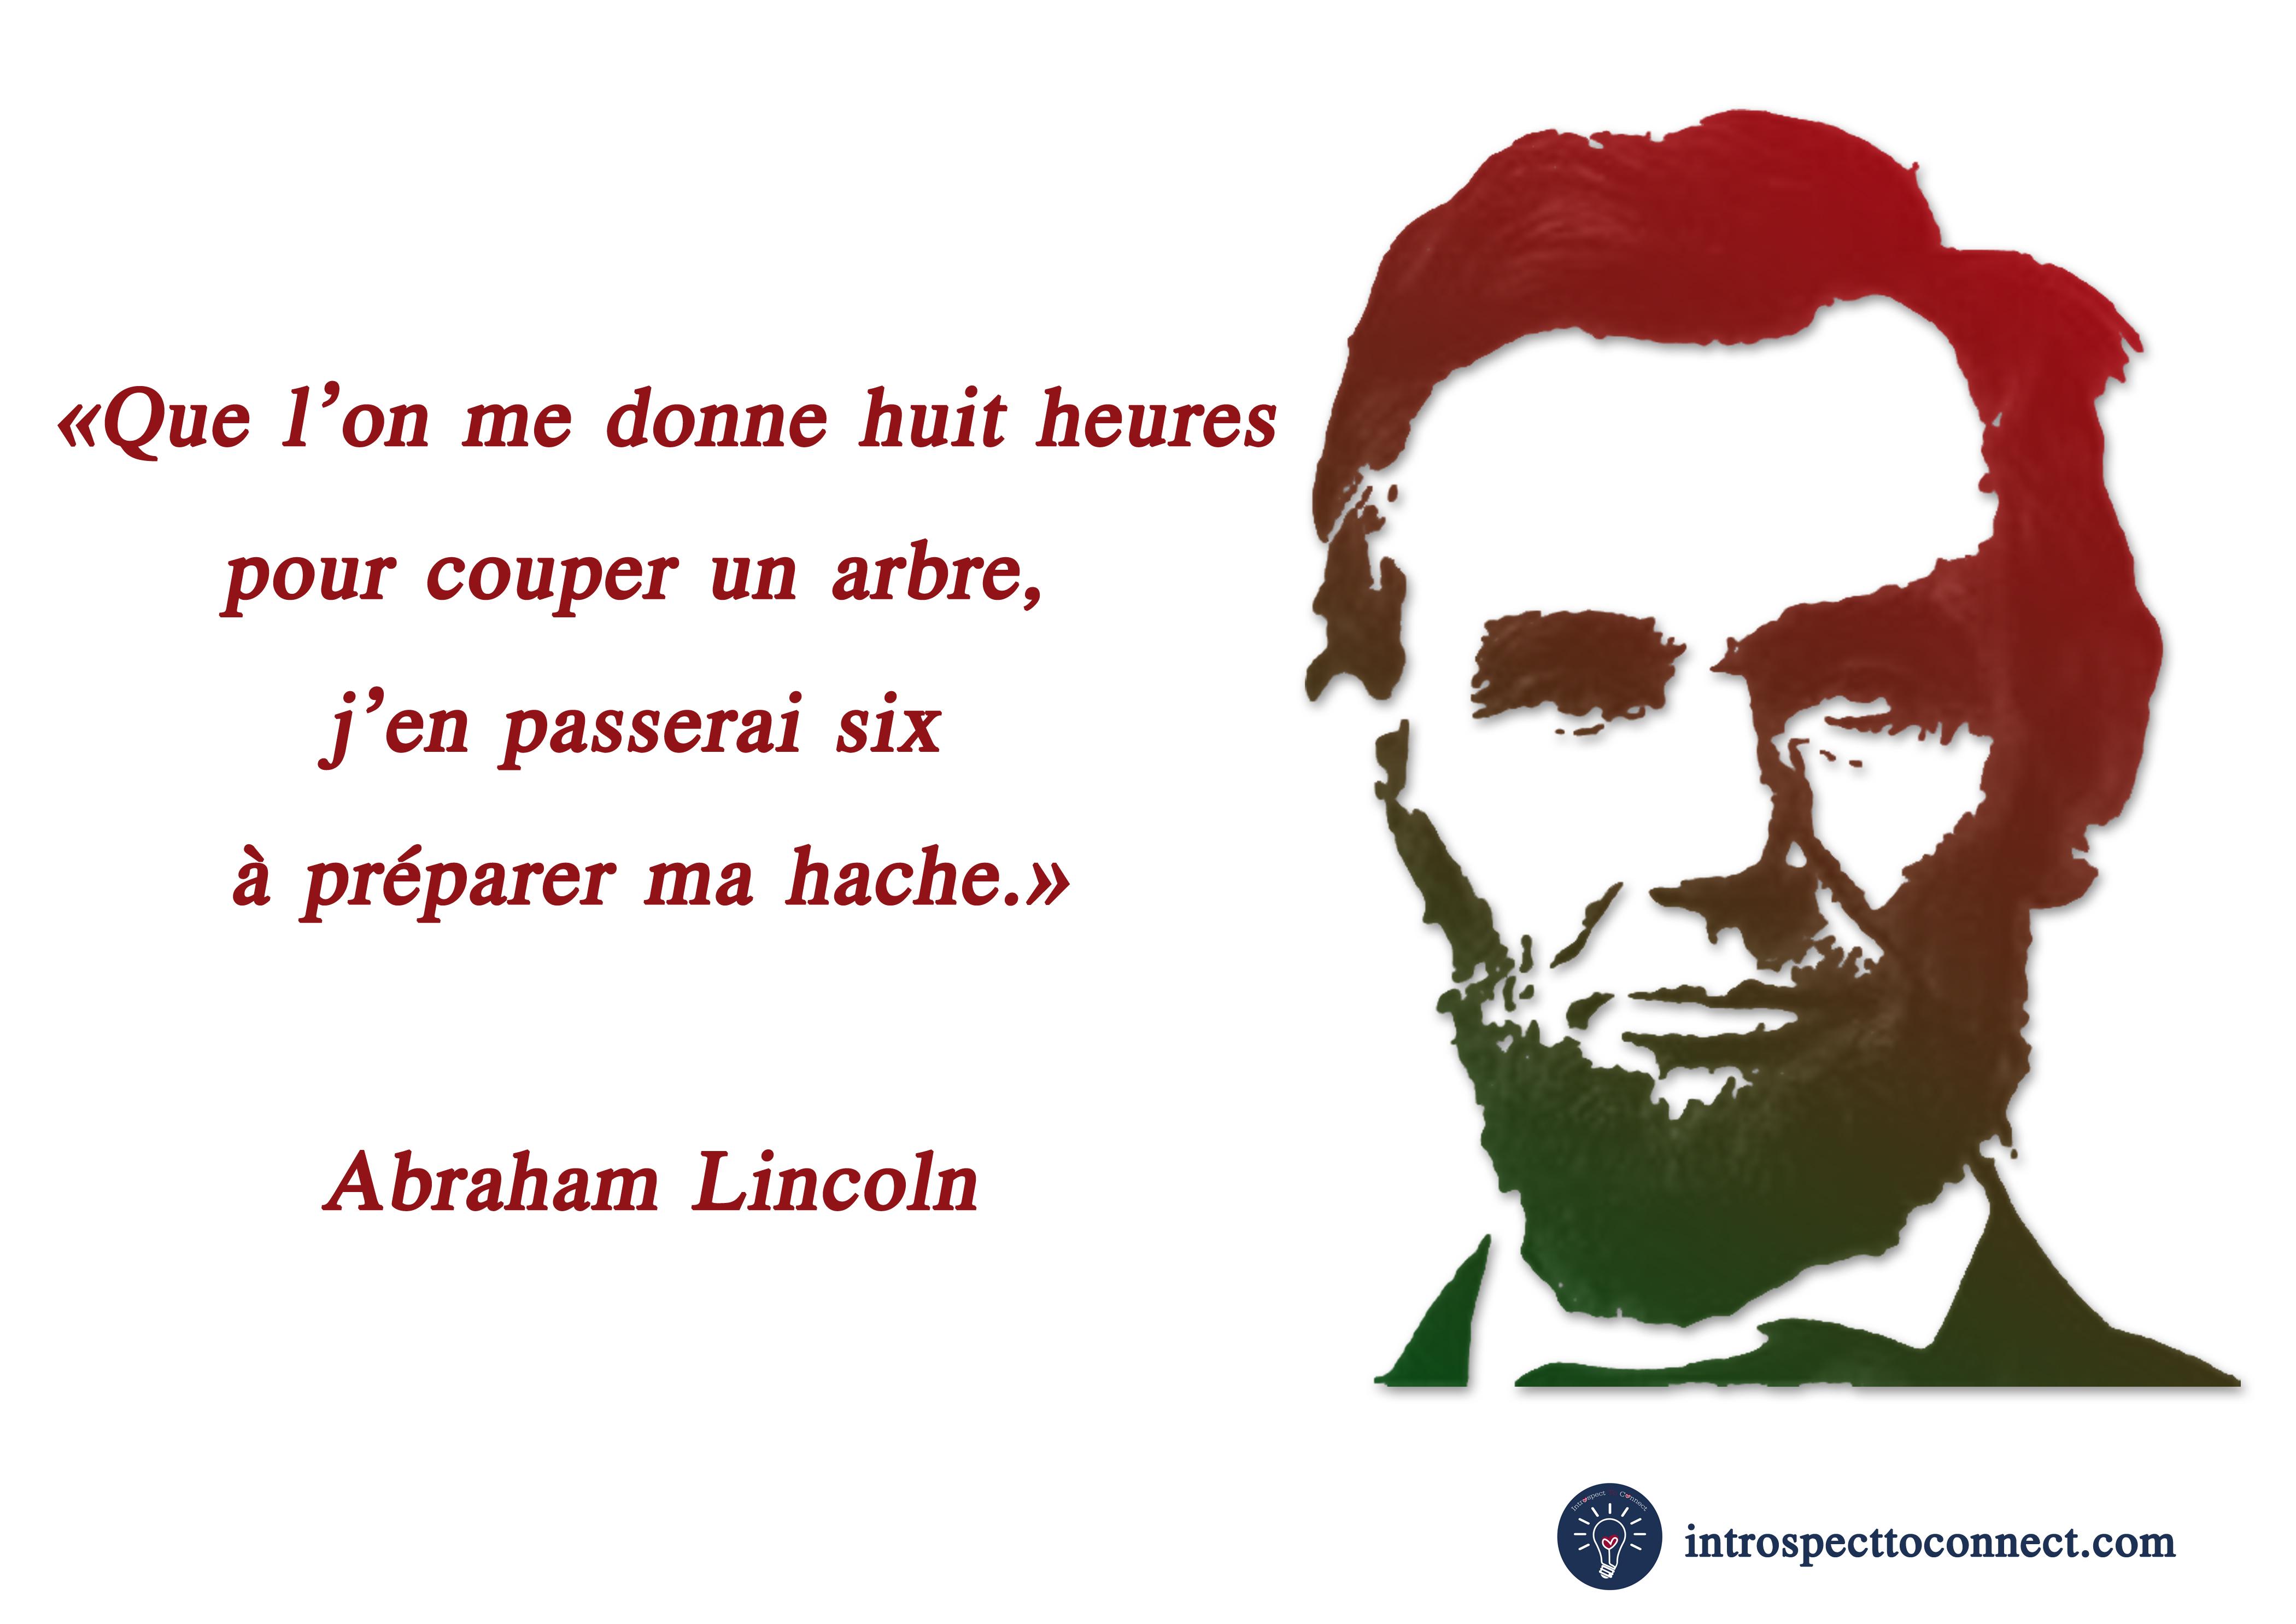 abraham-lincoln-quote-copie